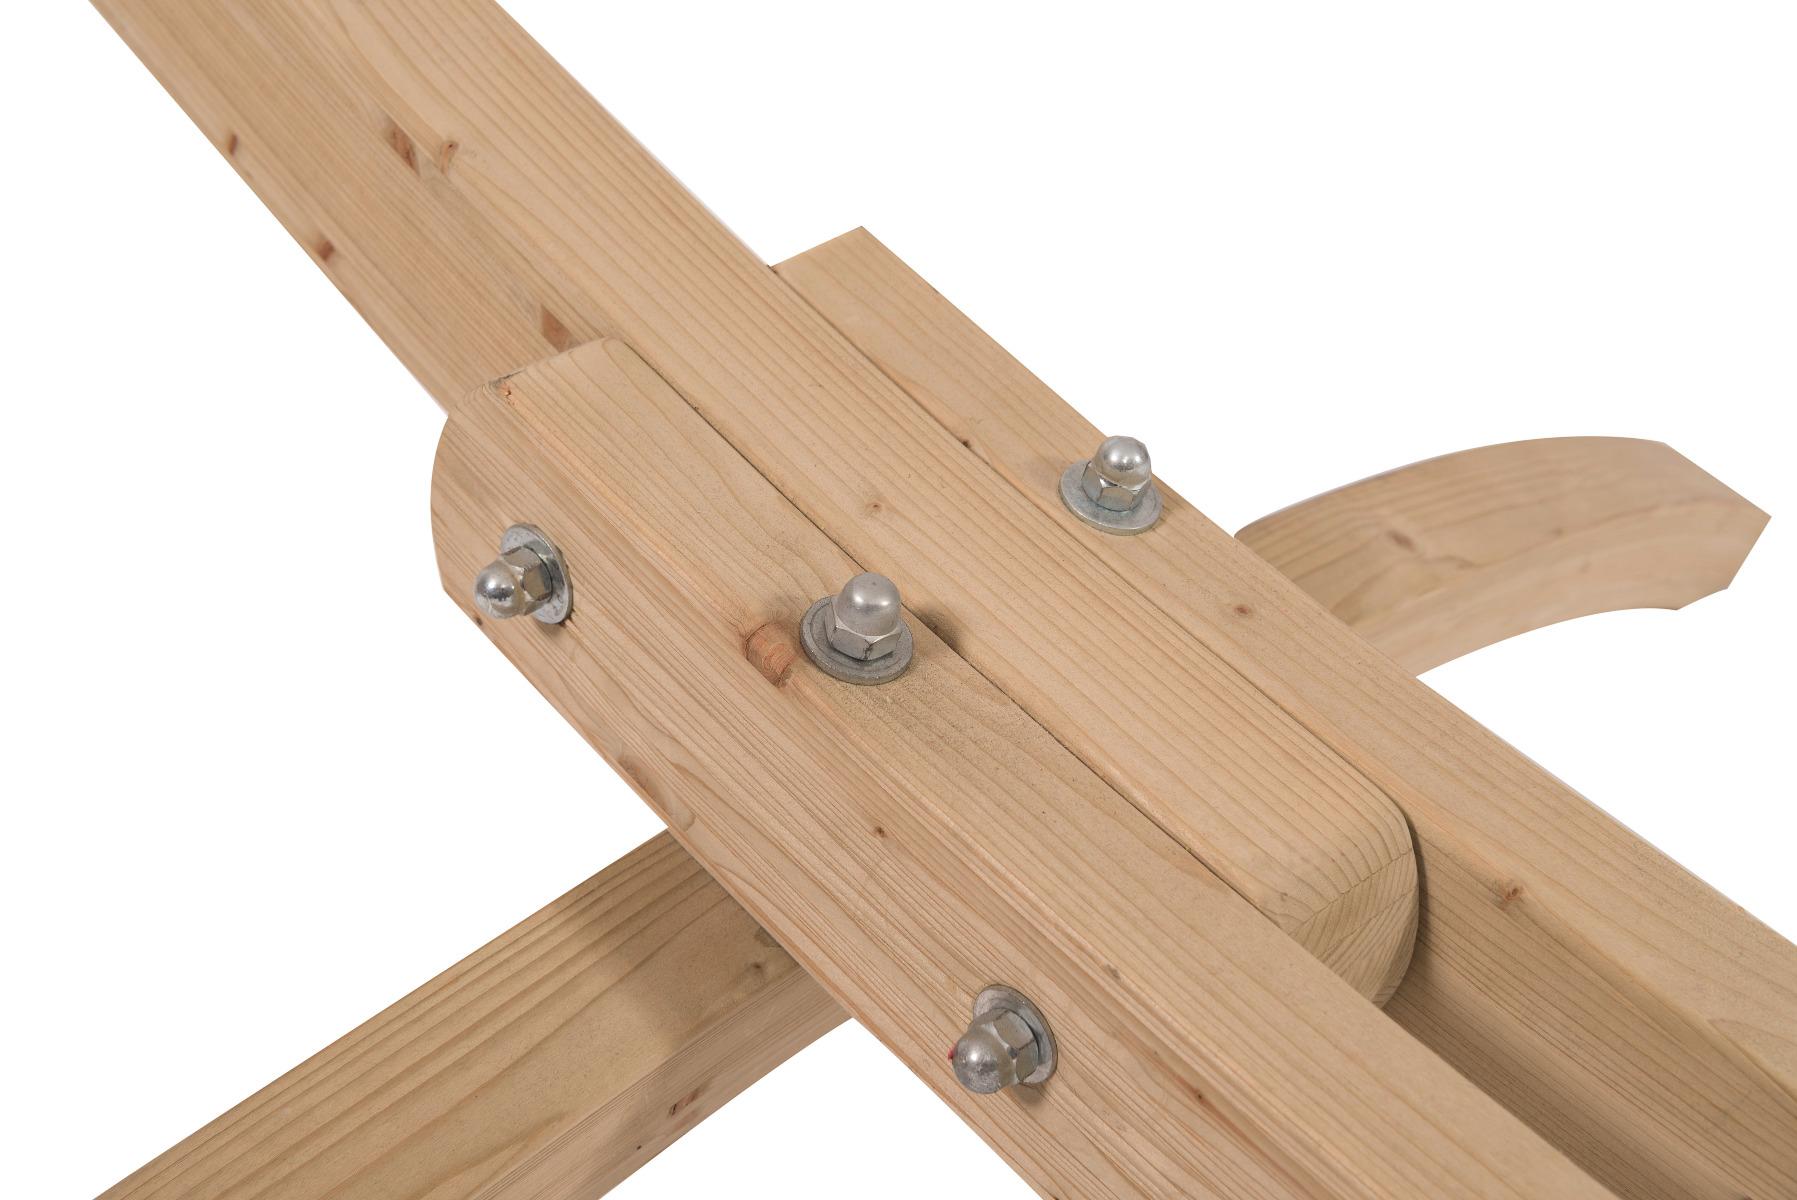 Hangmatstandaard 'Wood' tweepersoons